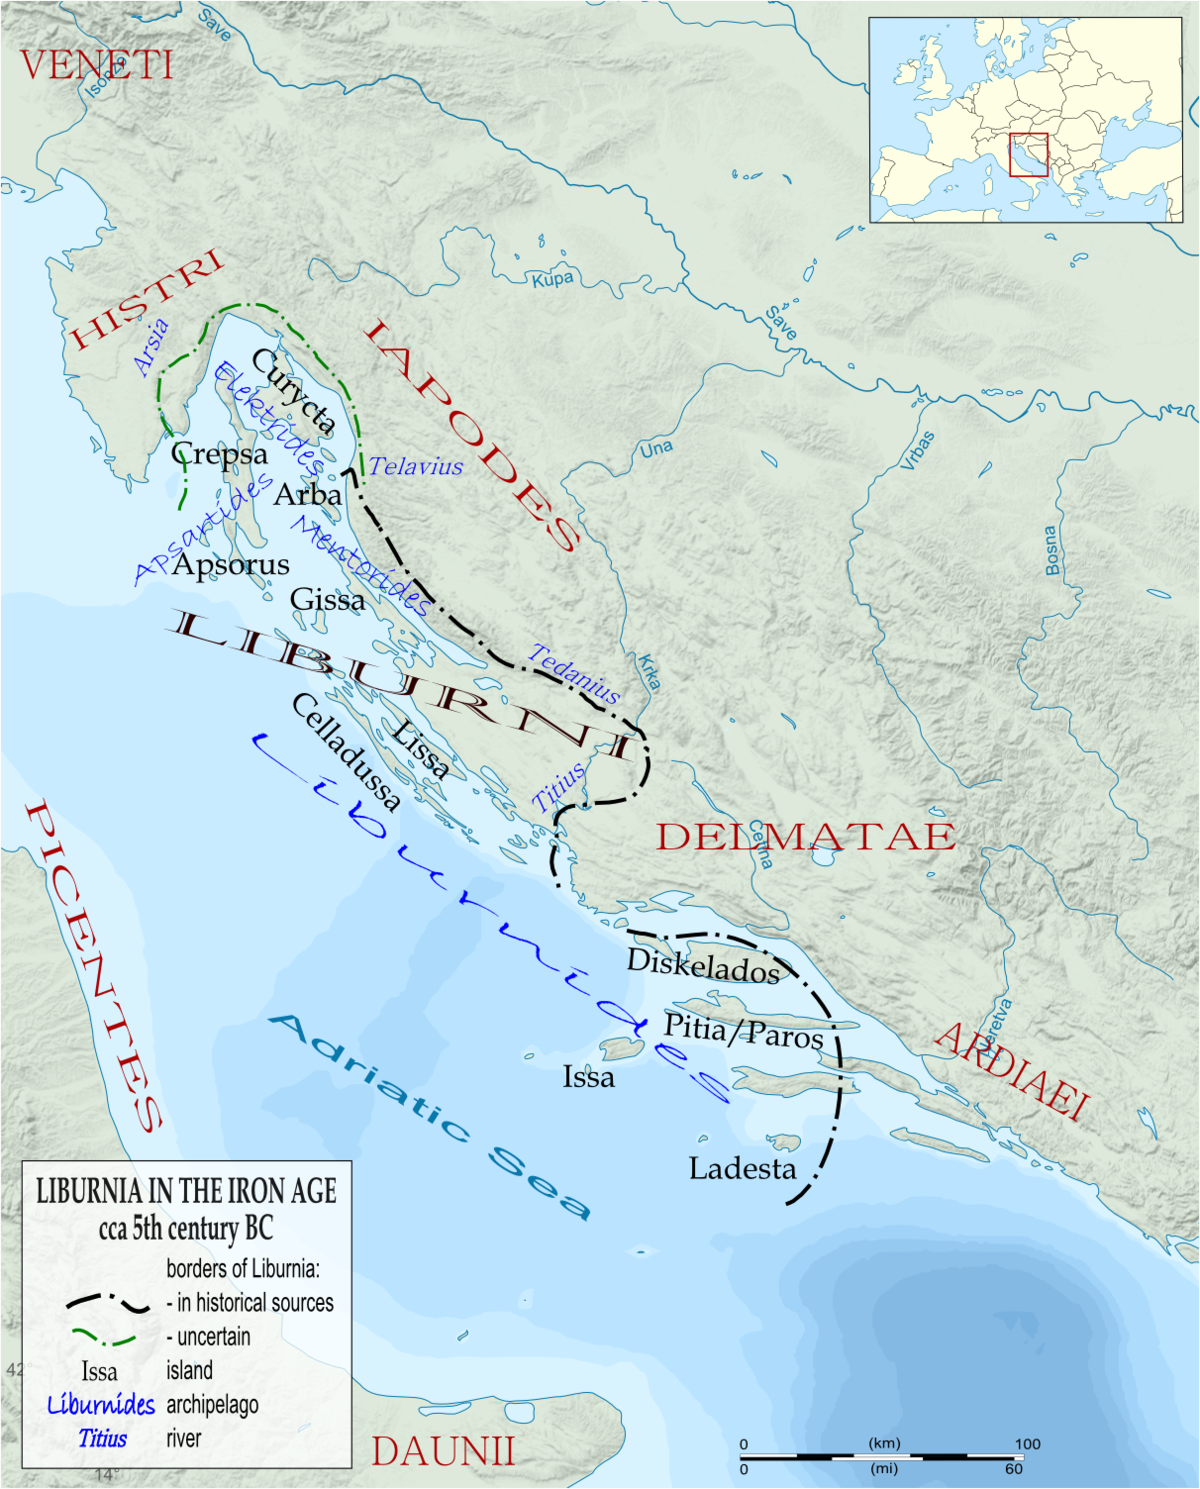 Battle of Pharos - Wikipedia on davis islands map, prince islands map, king islands map, hall islands map, berry islands map,